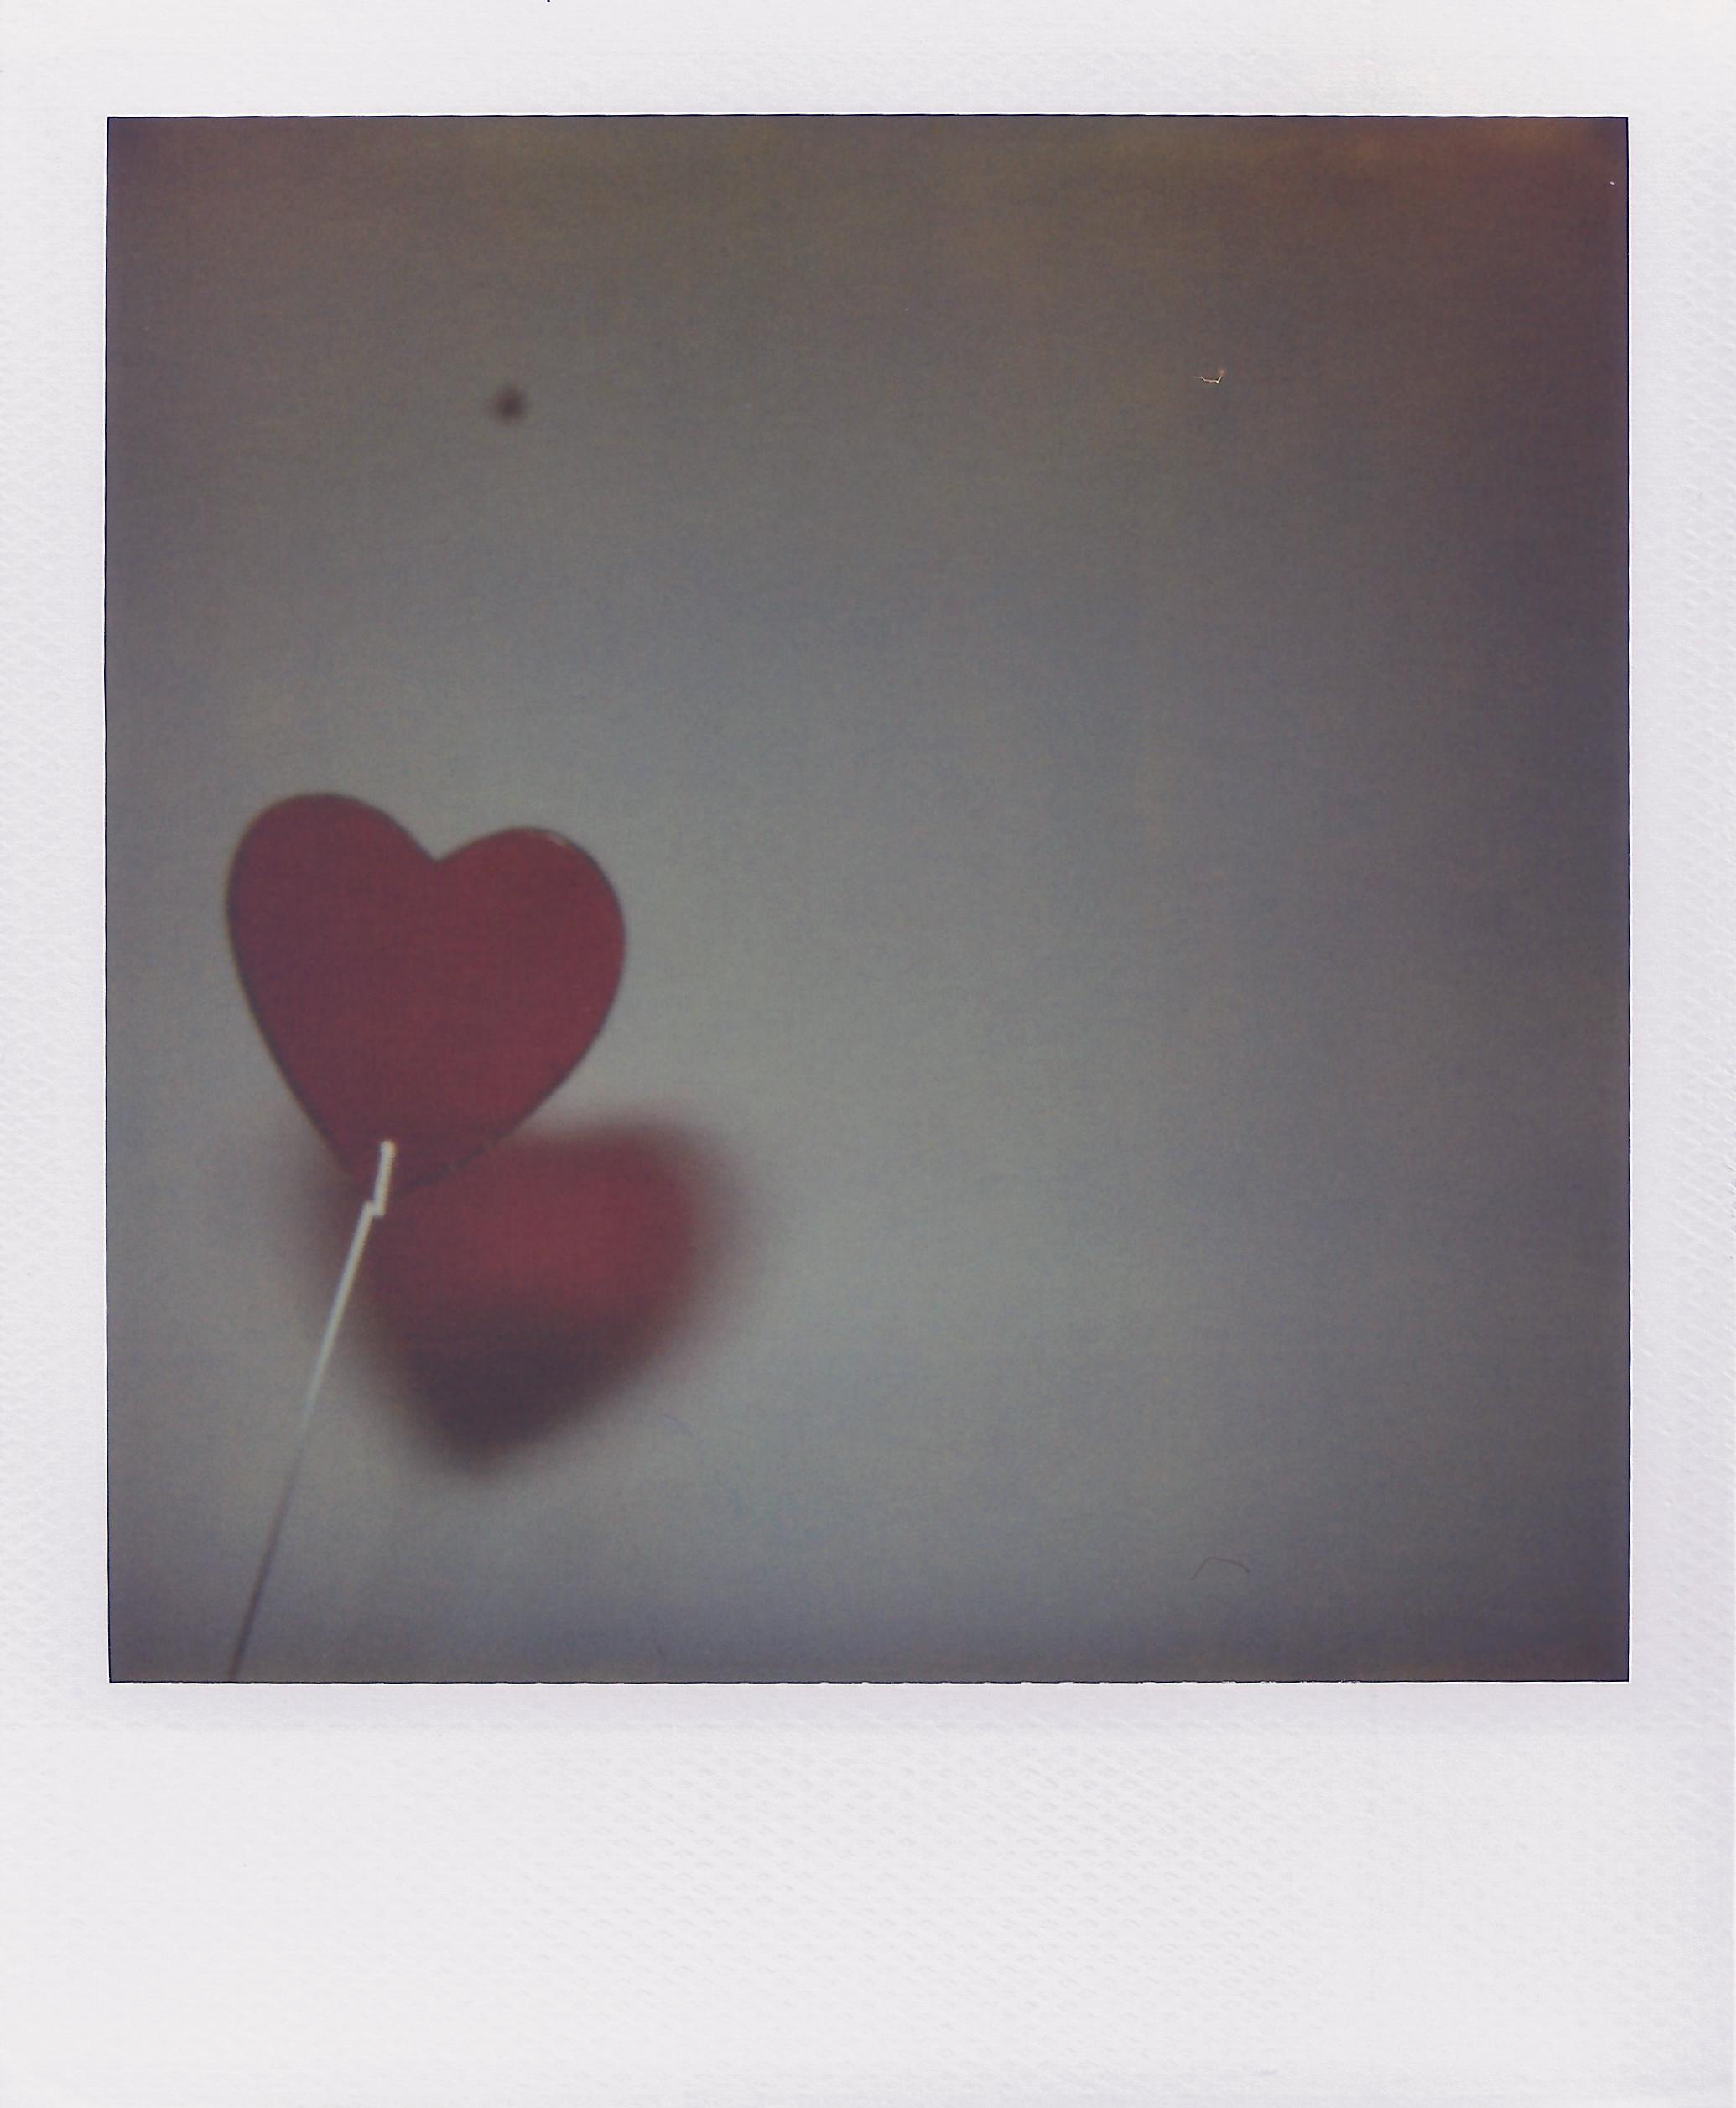 (heart) #22